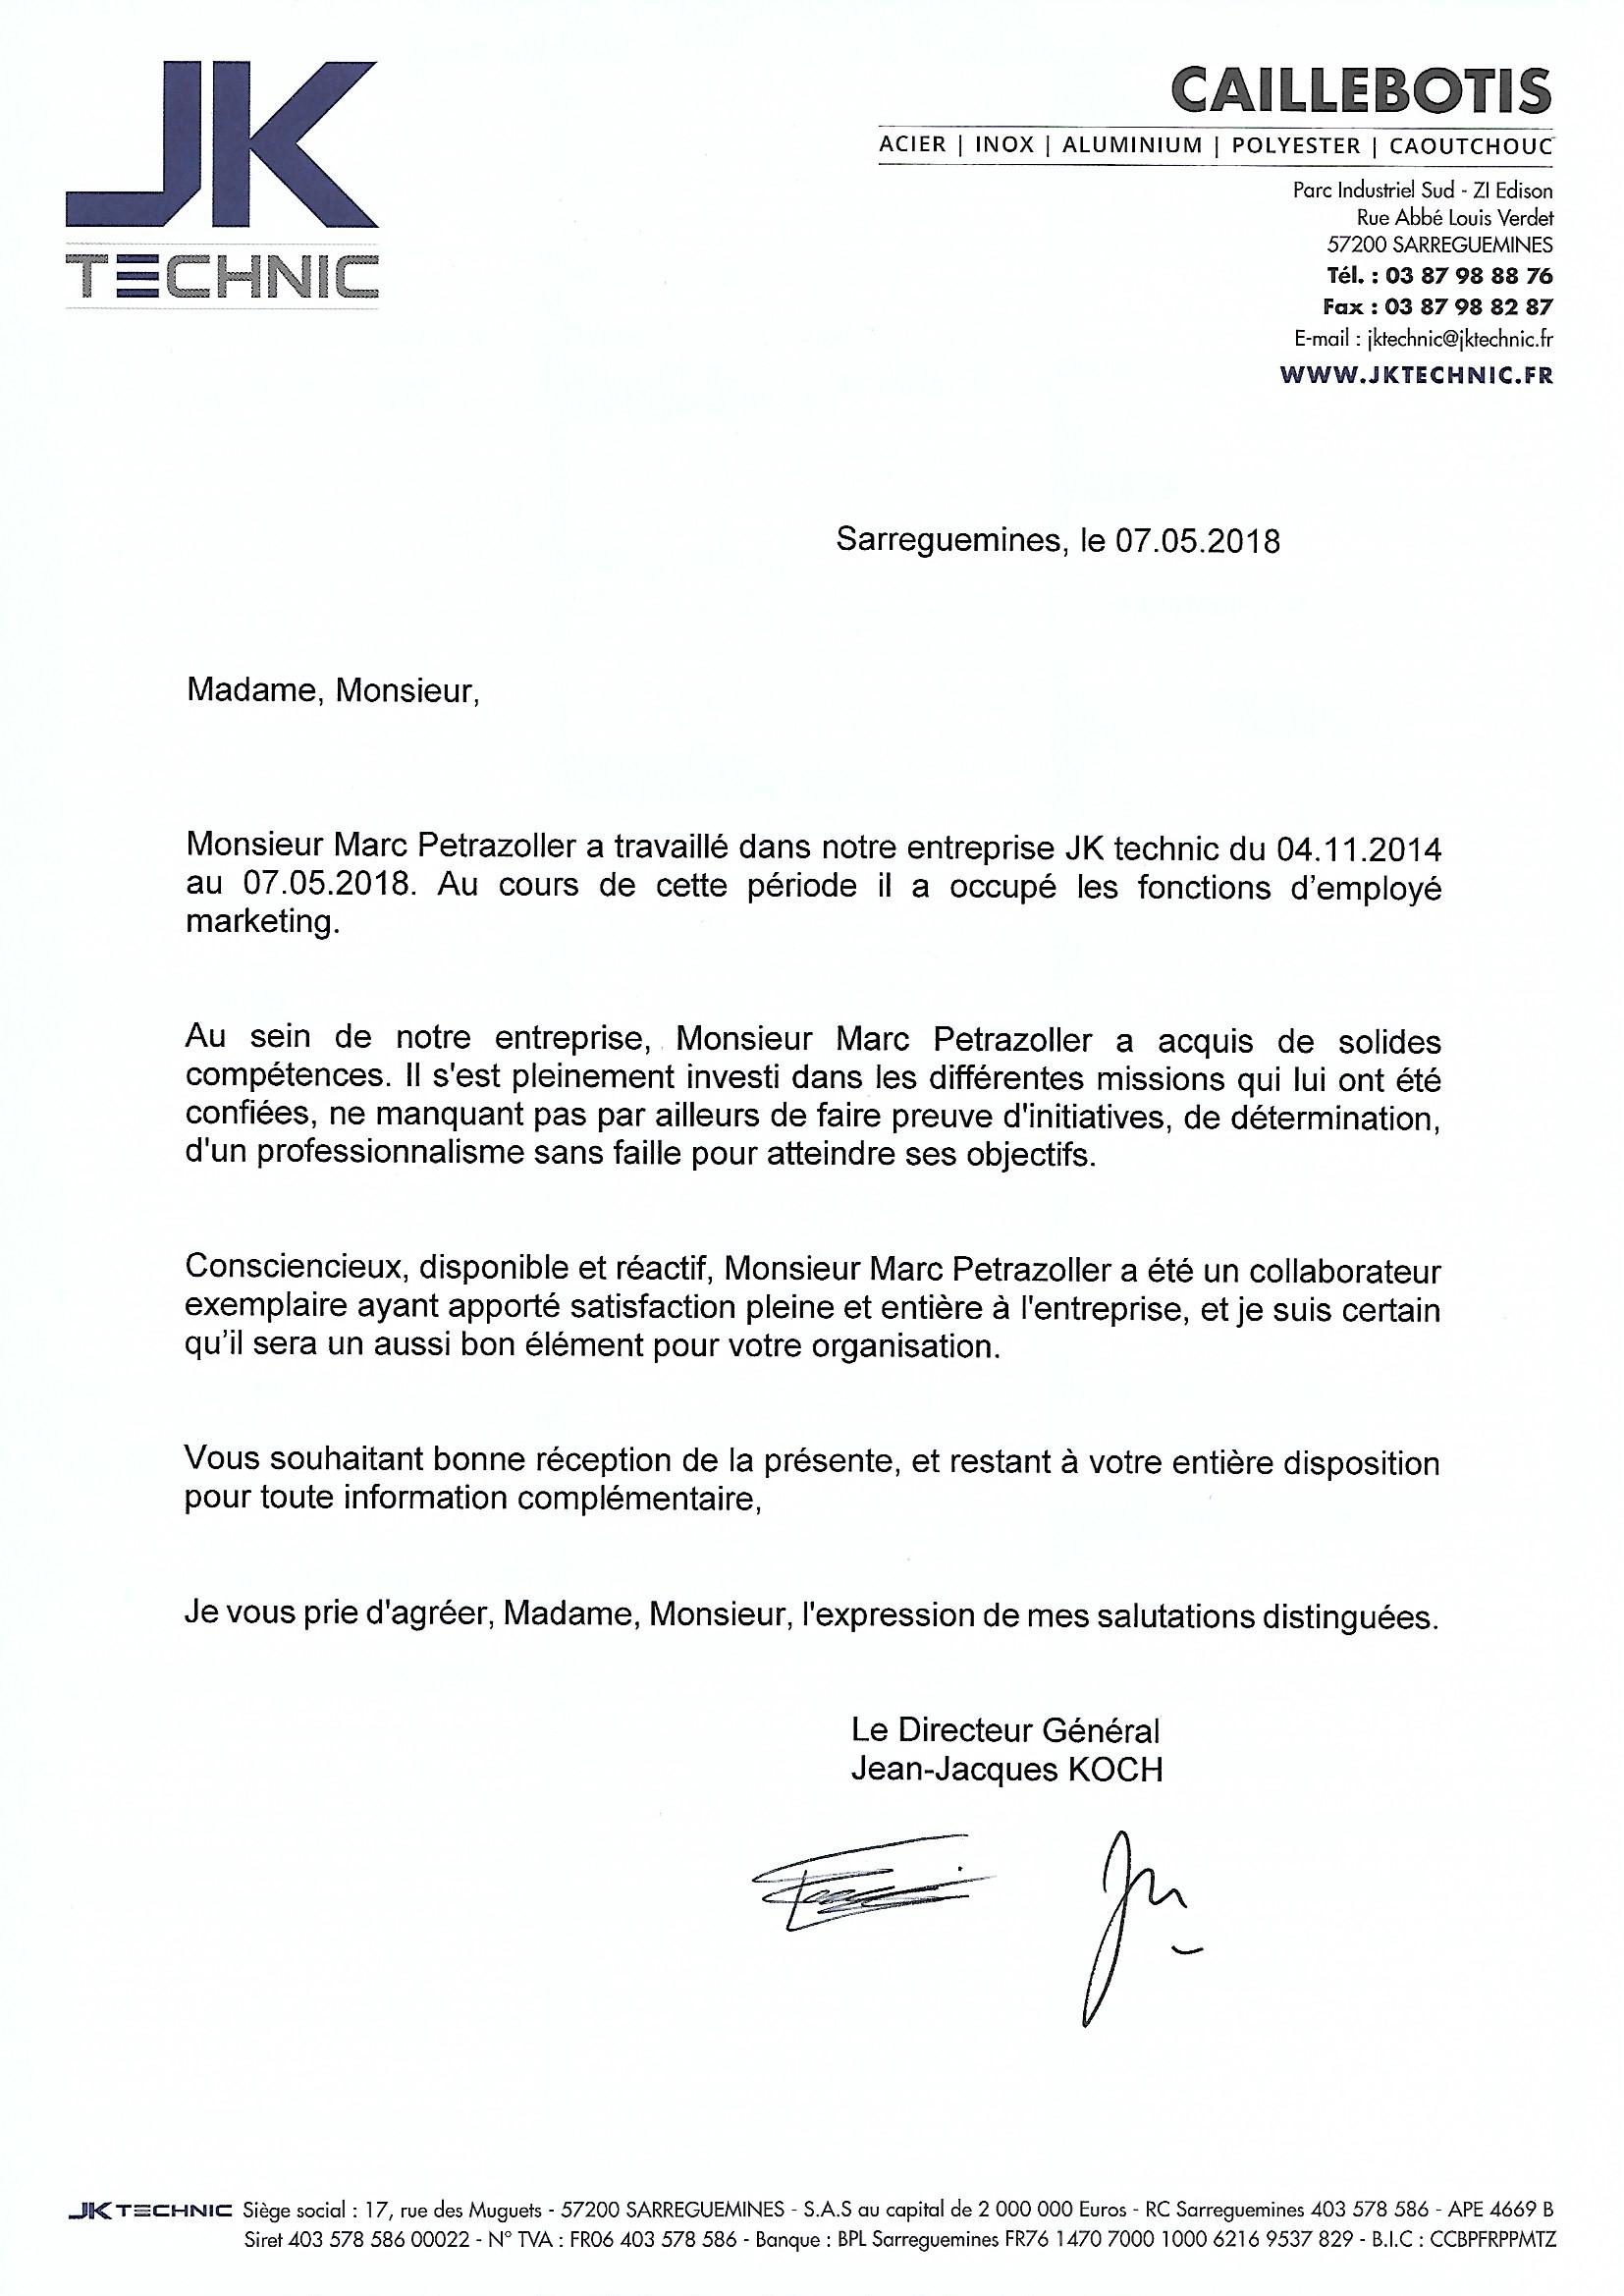 marc petrazoller - cv